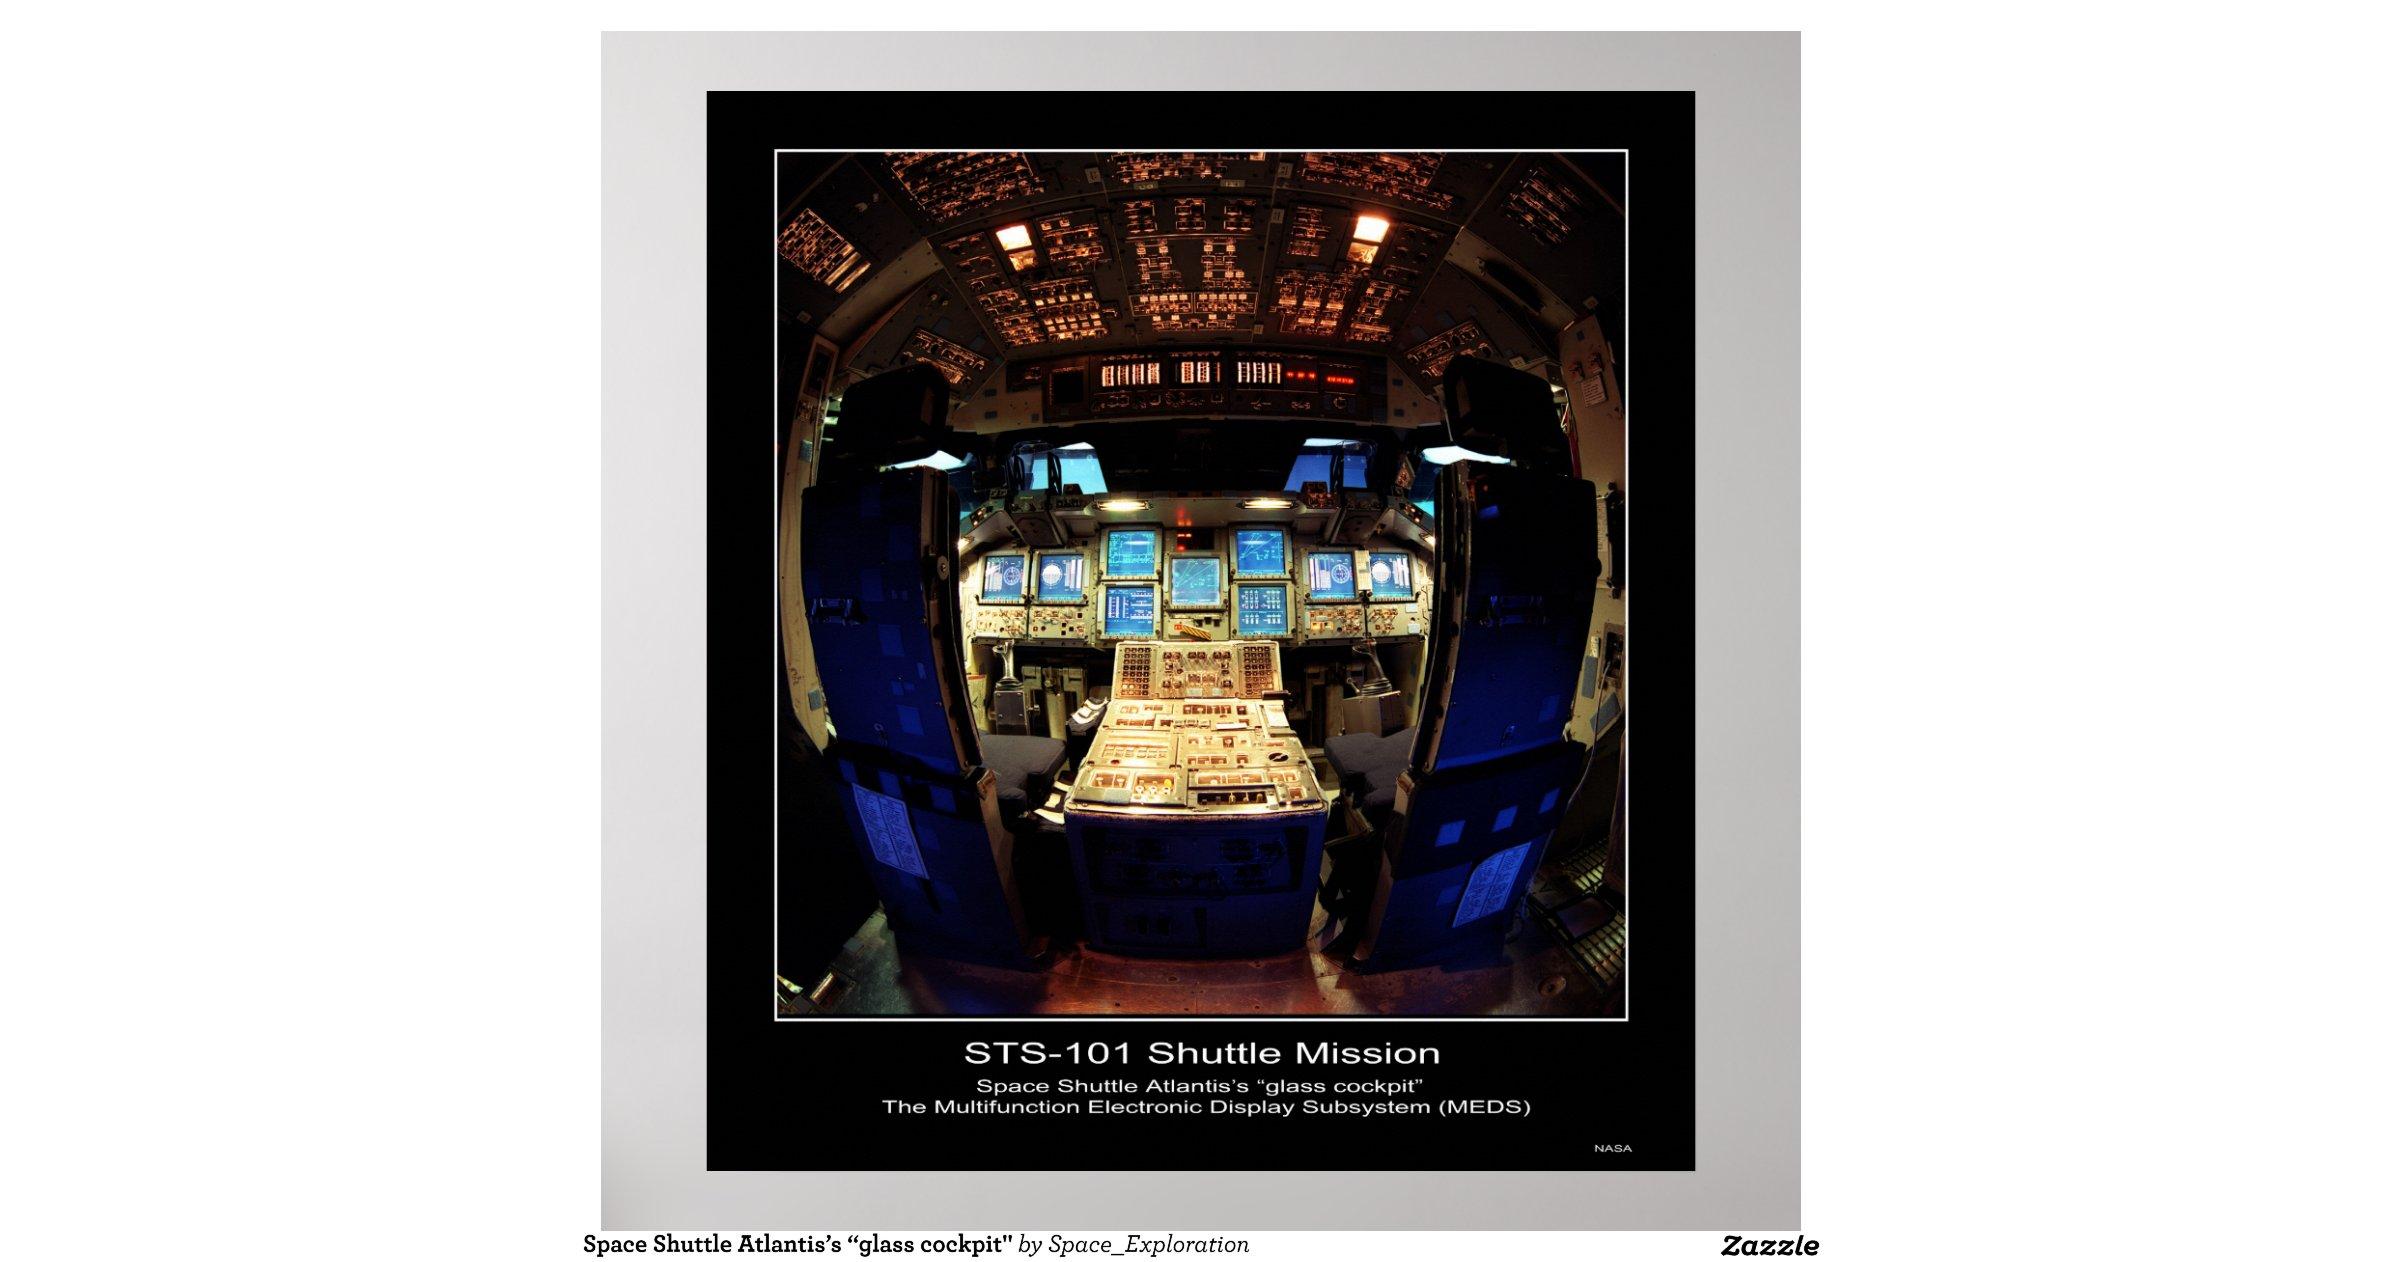 space_shuttle_atlantis_s_glass_cockpit_poster ...